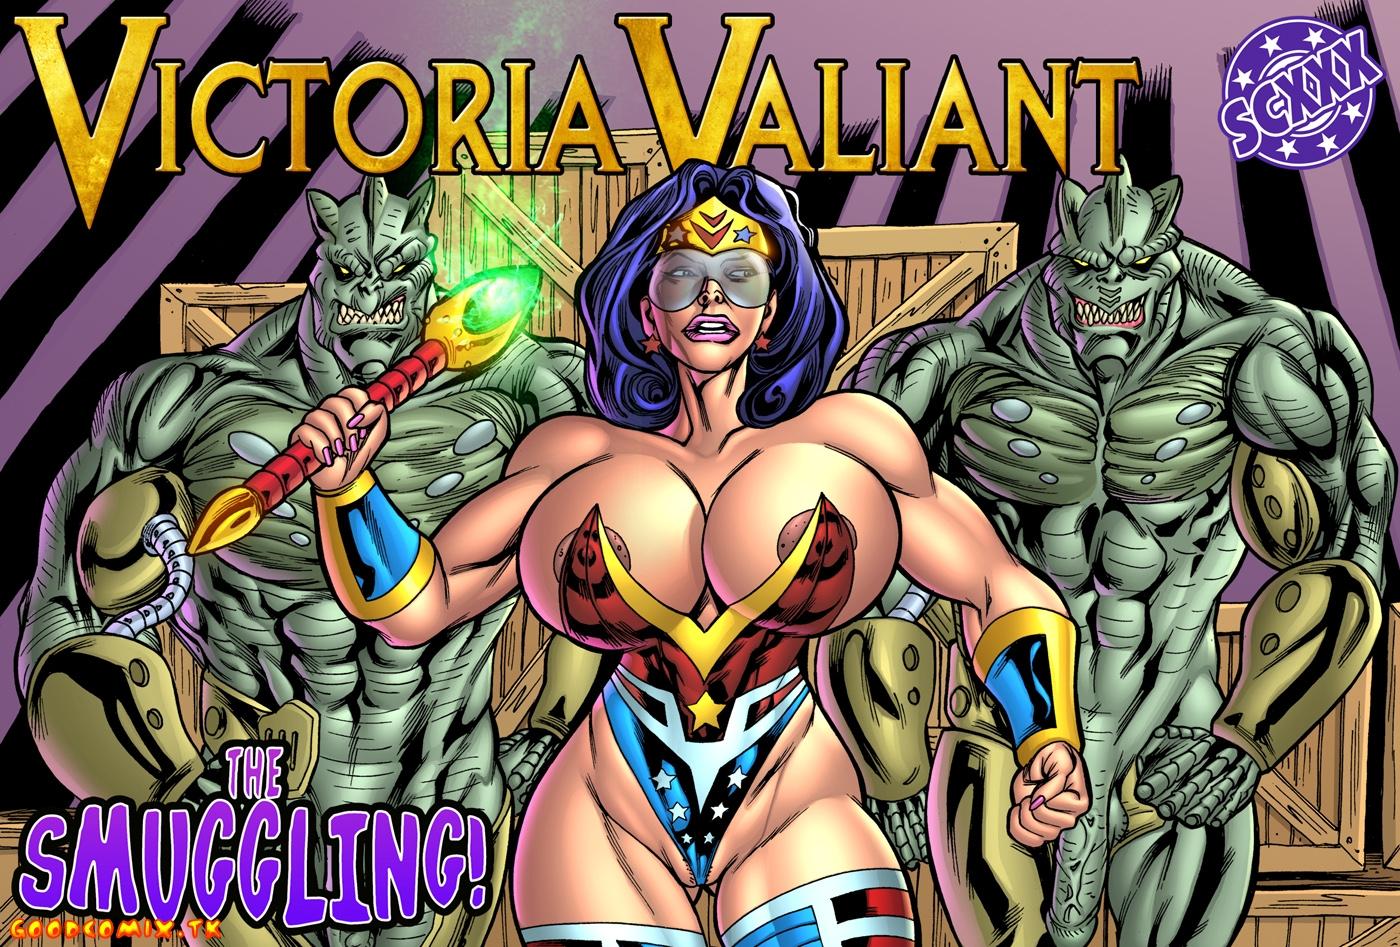 Goodcomix.tk Wonder Woman - [SuperHeroine Comixxx][Joe Alex] - Victoria Valiant - The Smuggling!